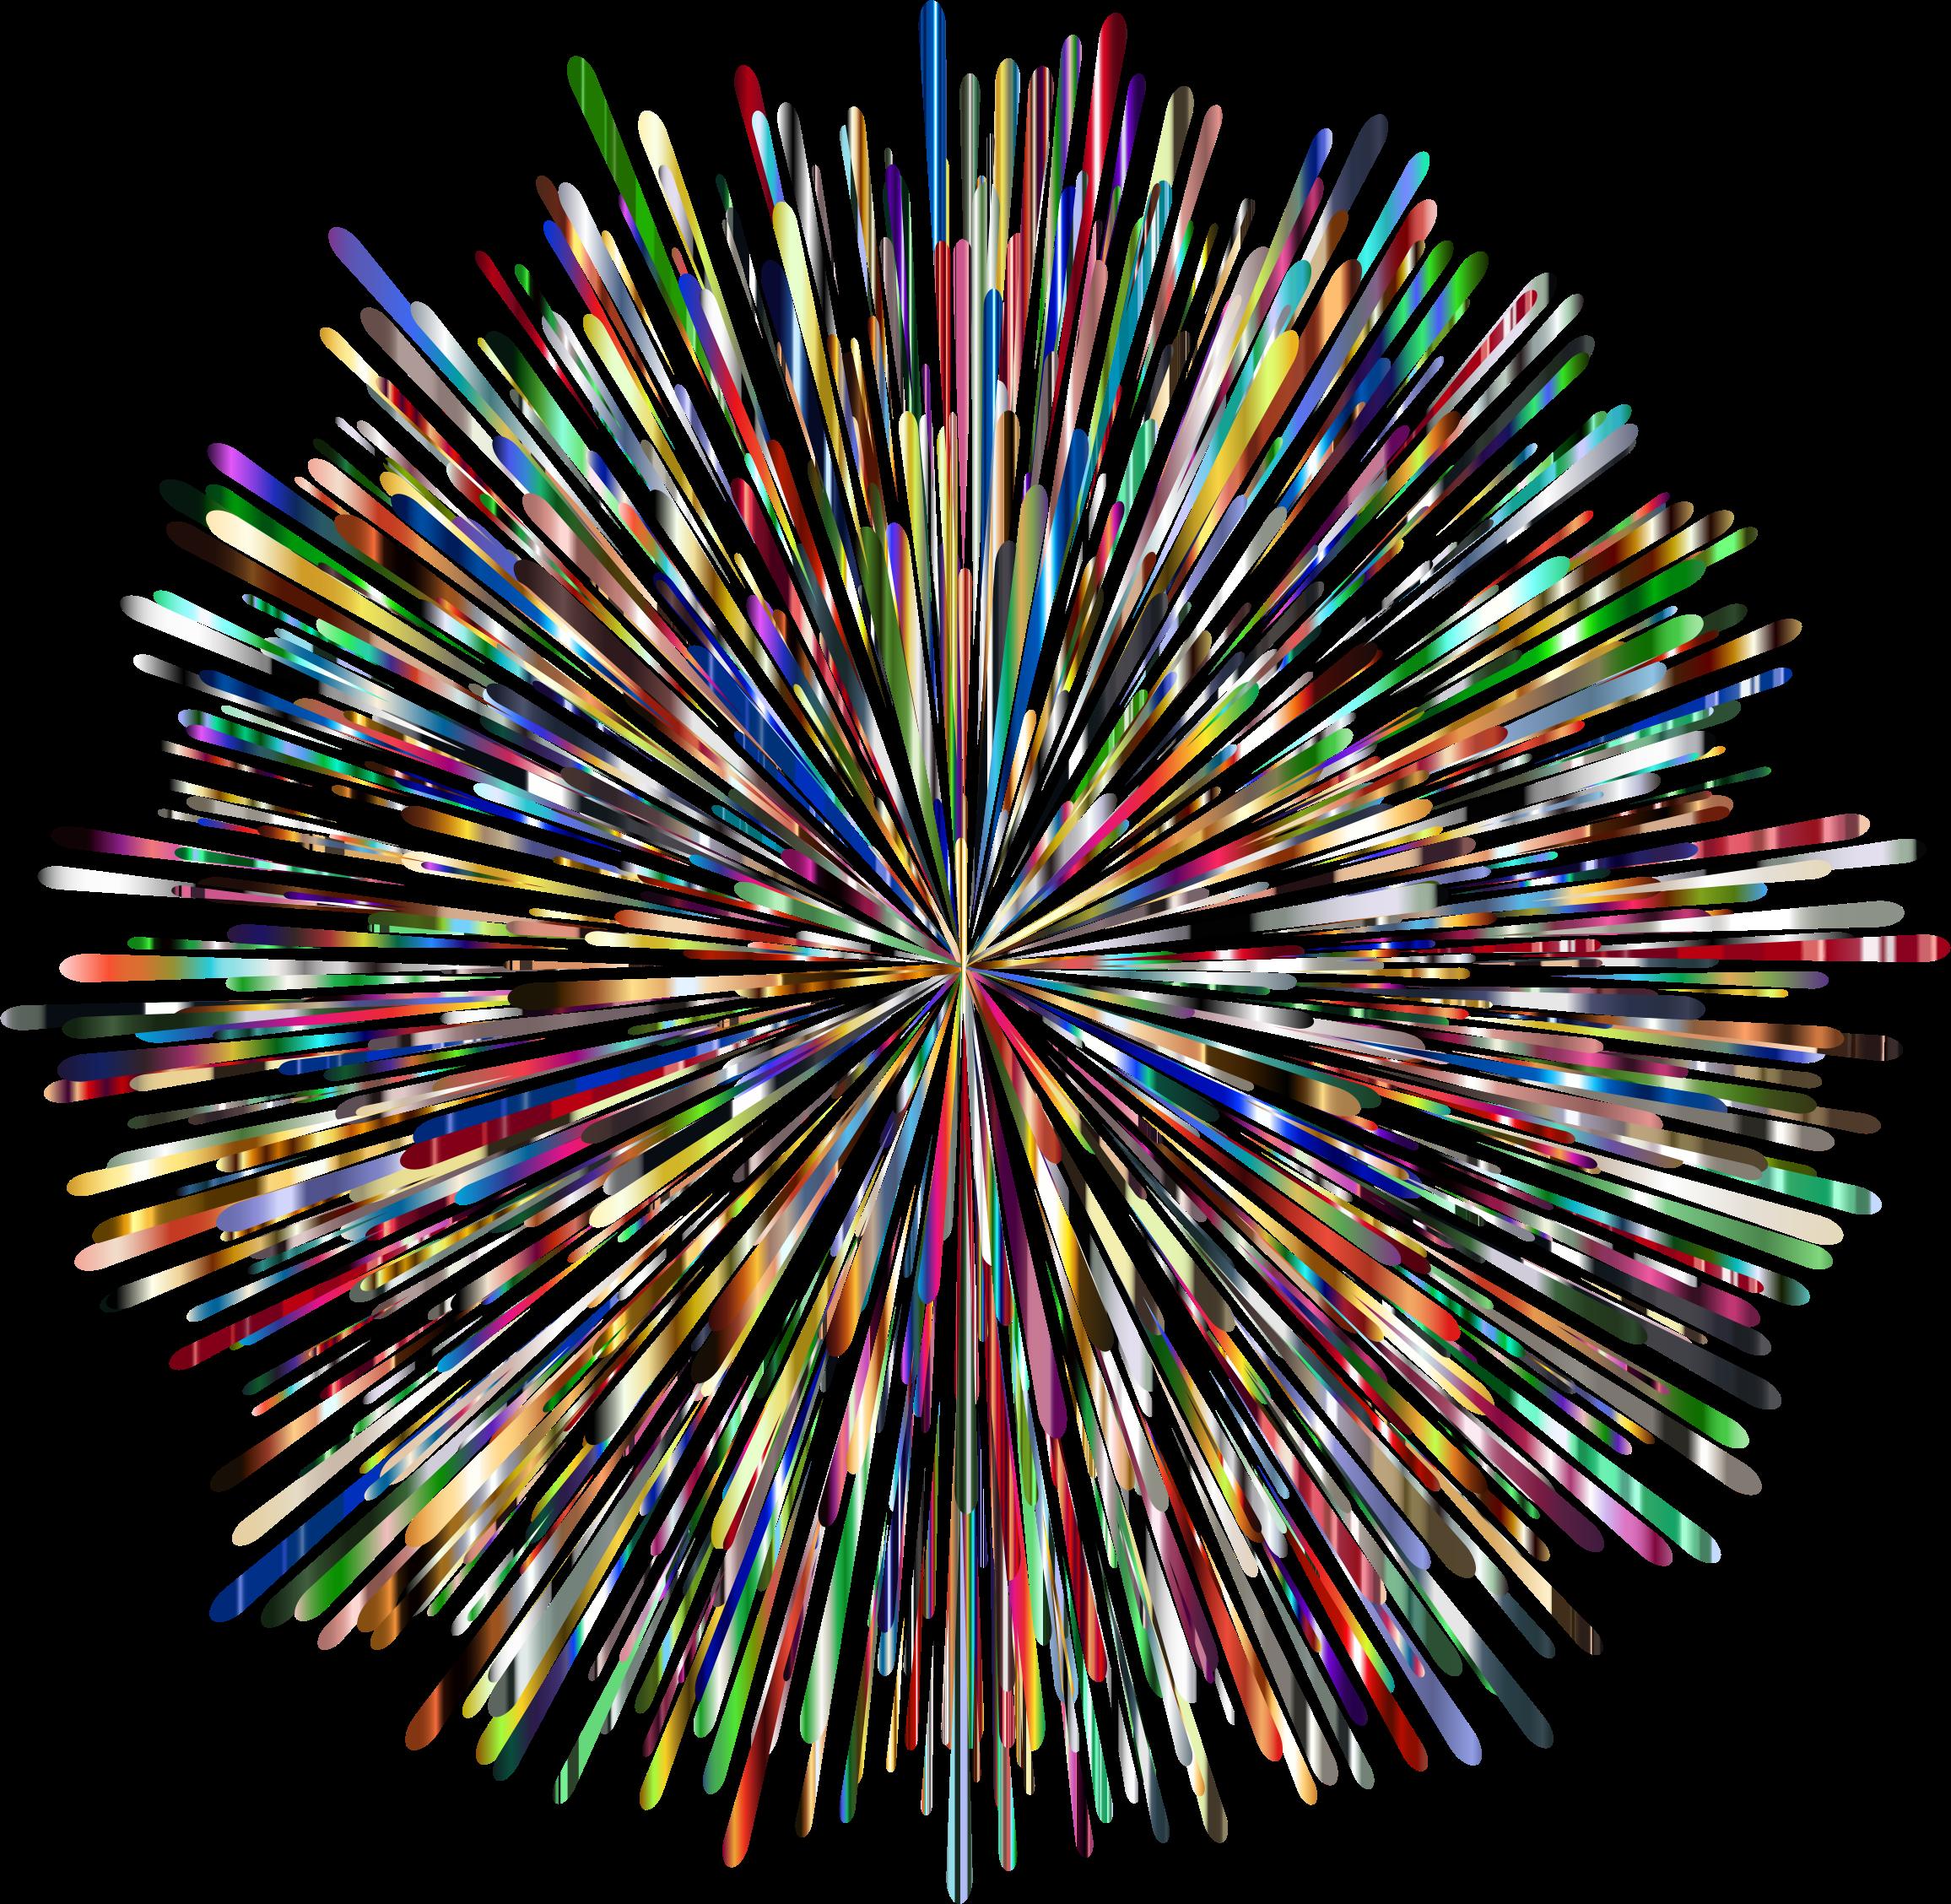 Clipart - Prismatic Fireworks 6 No Background